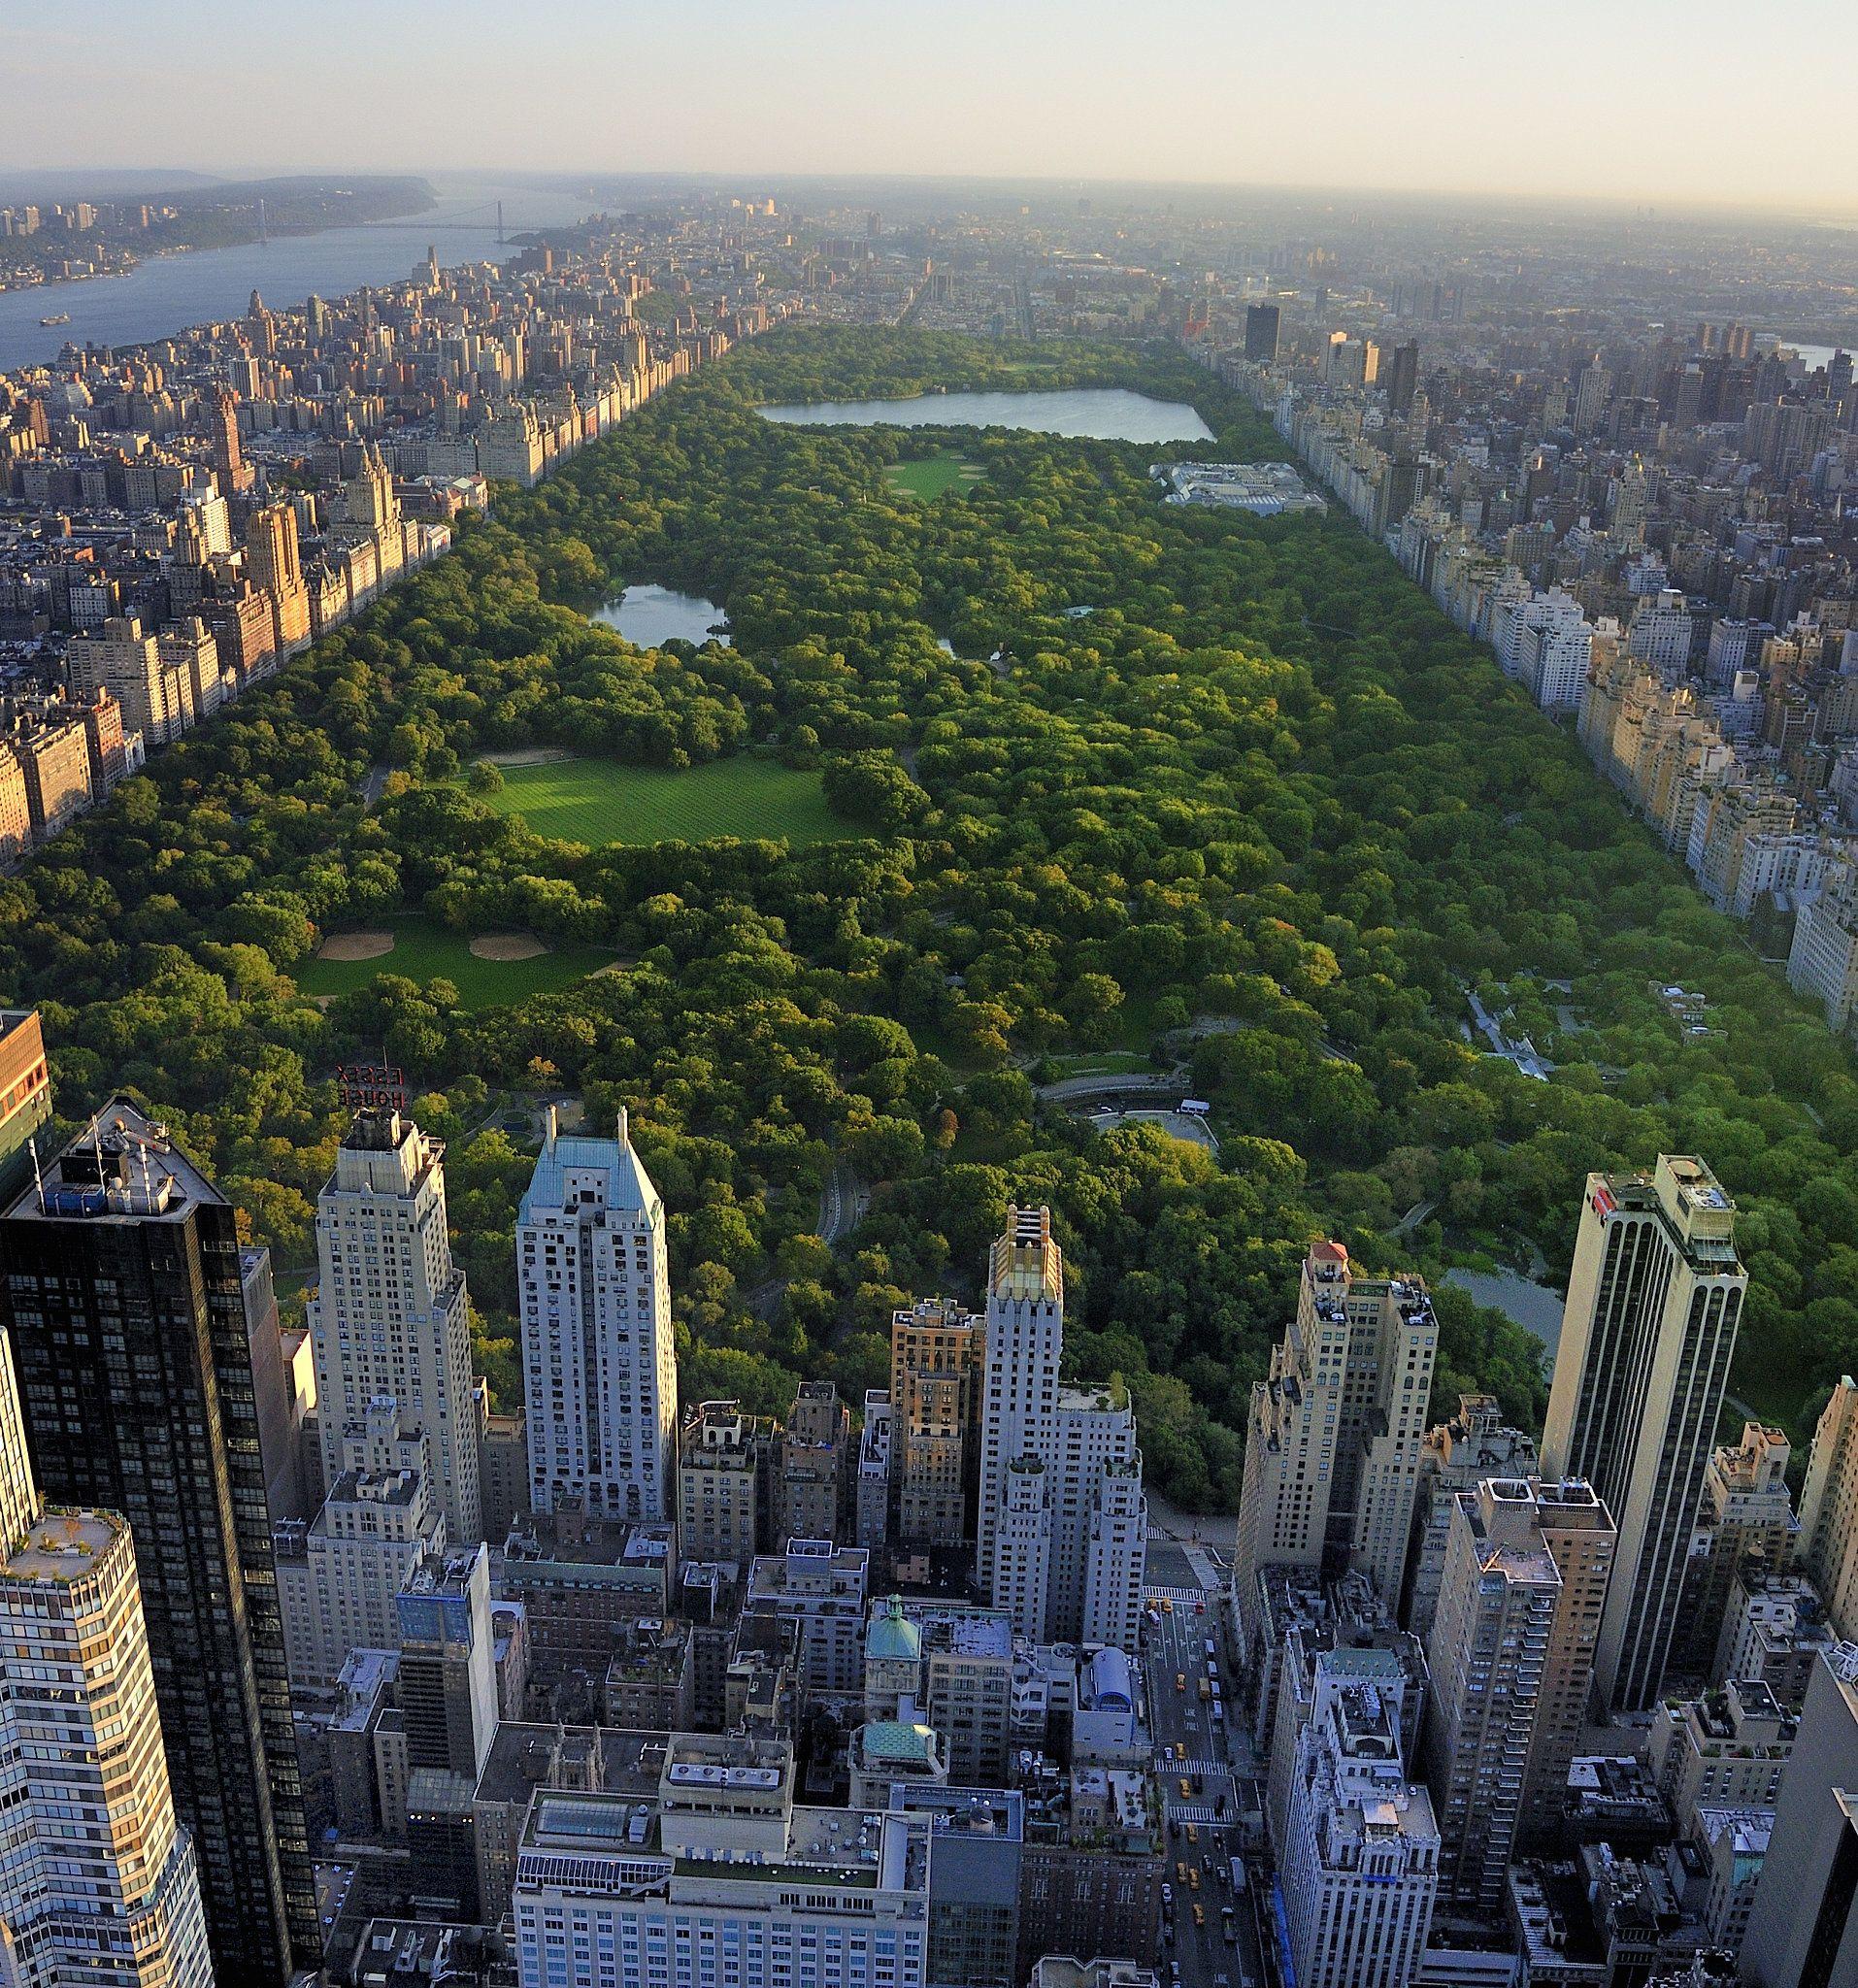 Centeral Park: Central Park